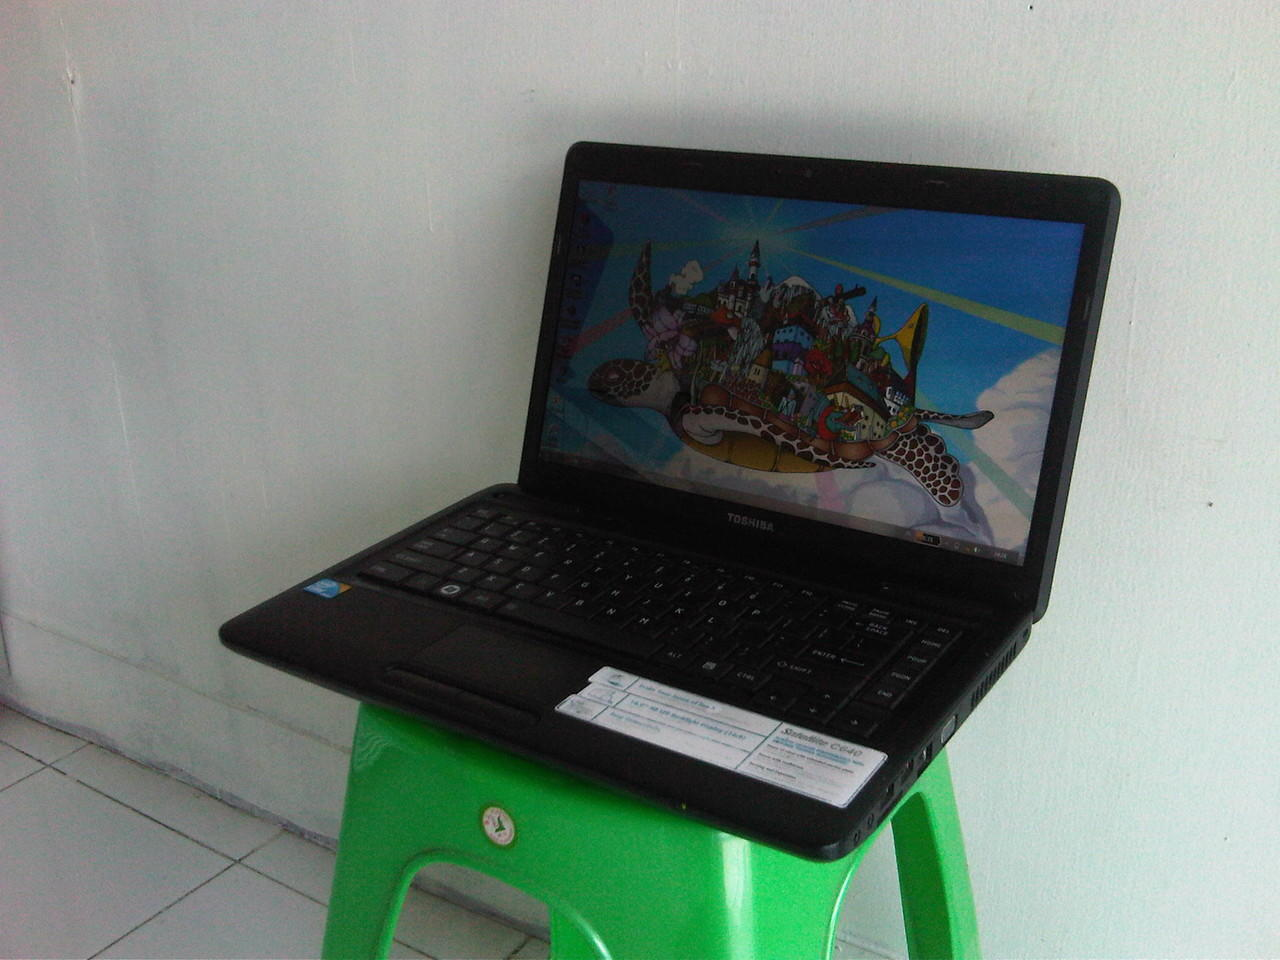 Laptop Toshiba C640 Core i3 DDR3 1 GB HDD 320 GB